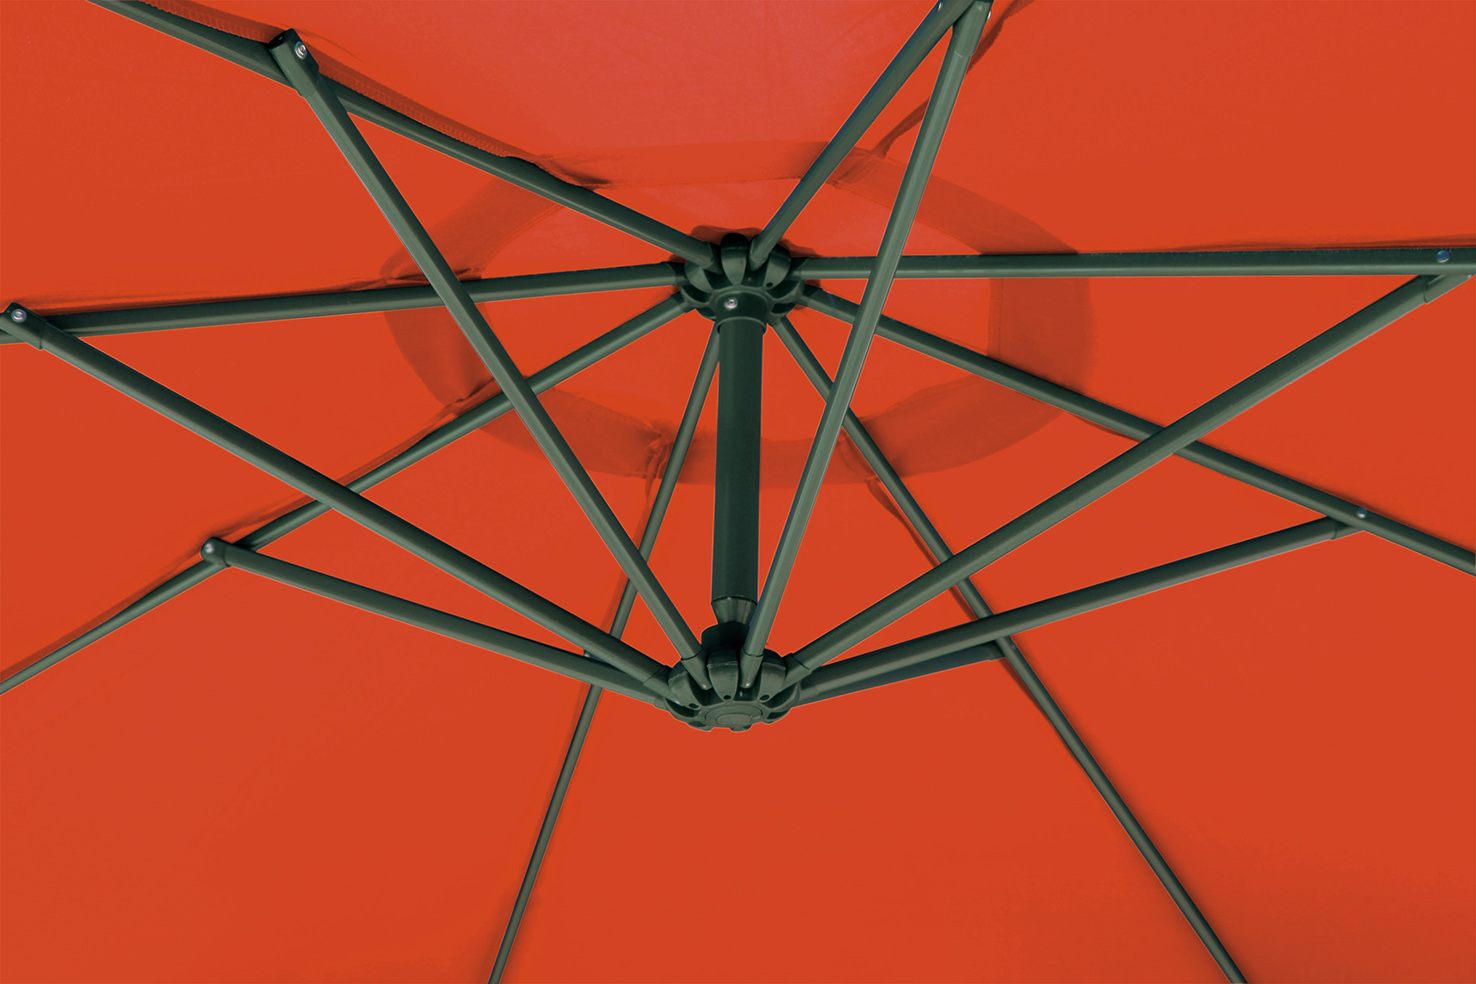 ampelschirm gartenschirm sonnenschirm 300 cm t v gs gepr ft uv 80 terrakotta ebay. Black Bedroom Furniture Sets. Home Design Ideas